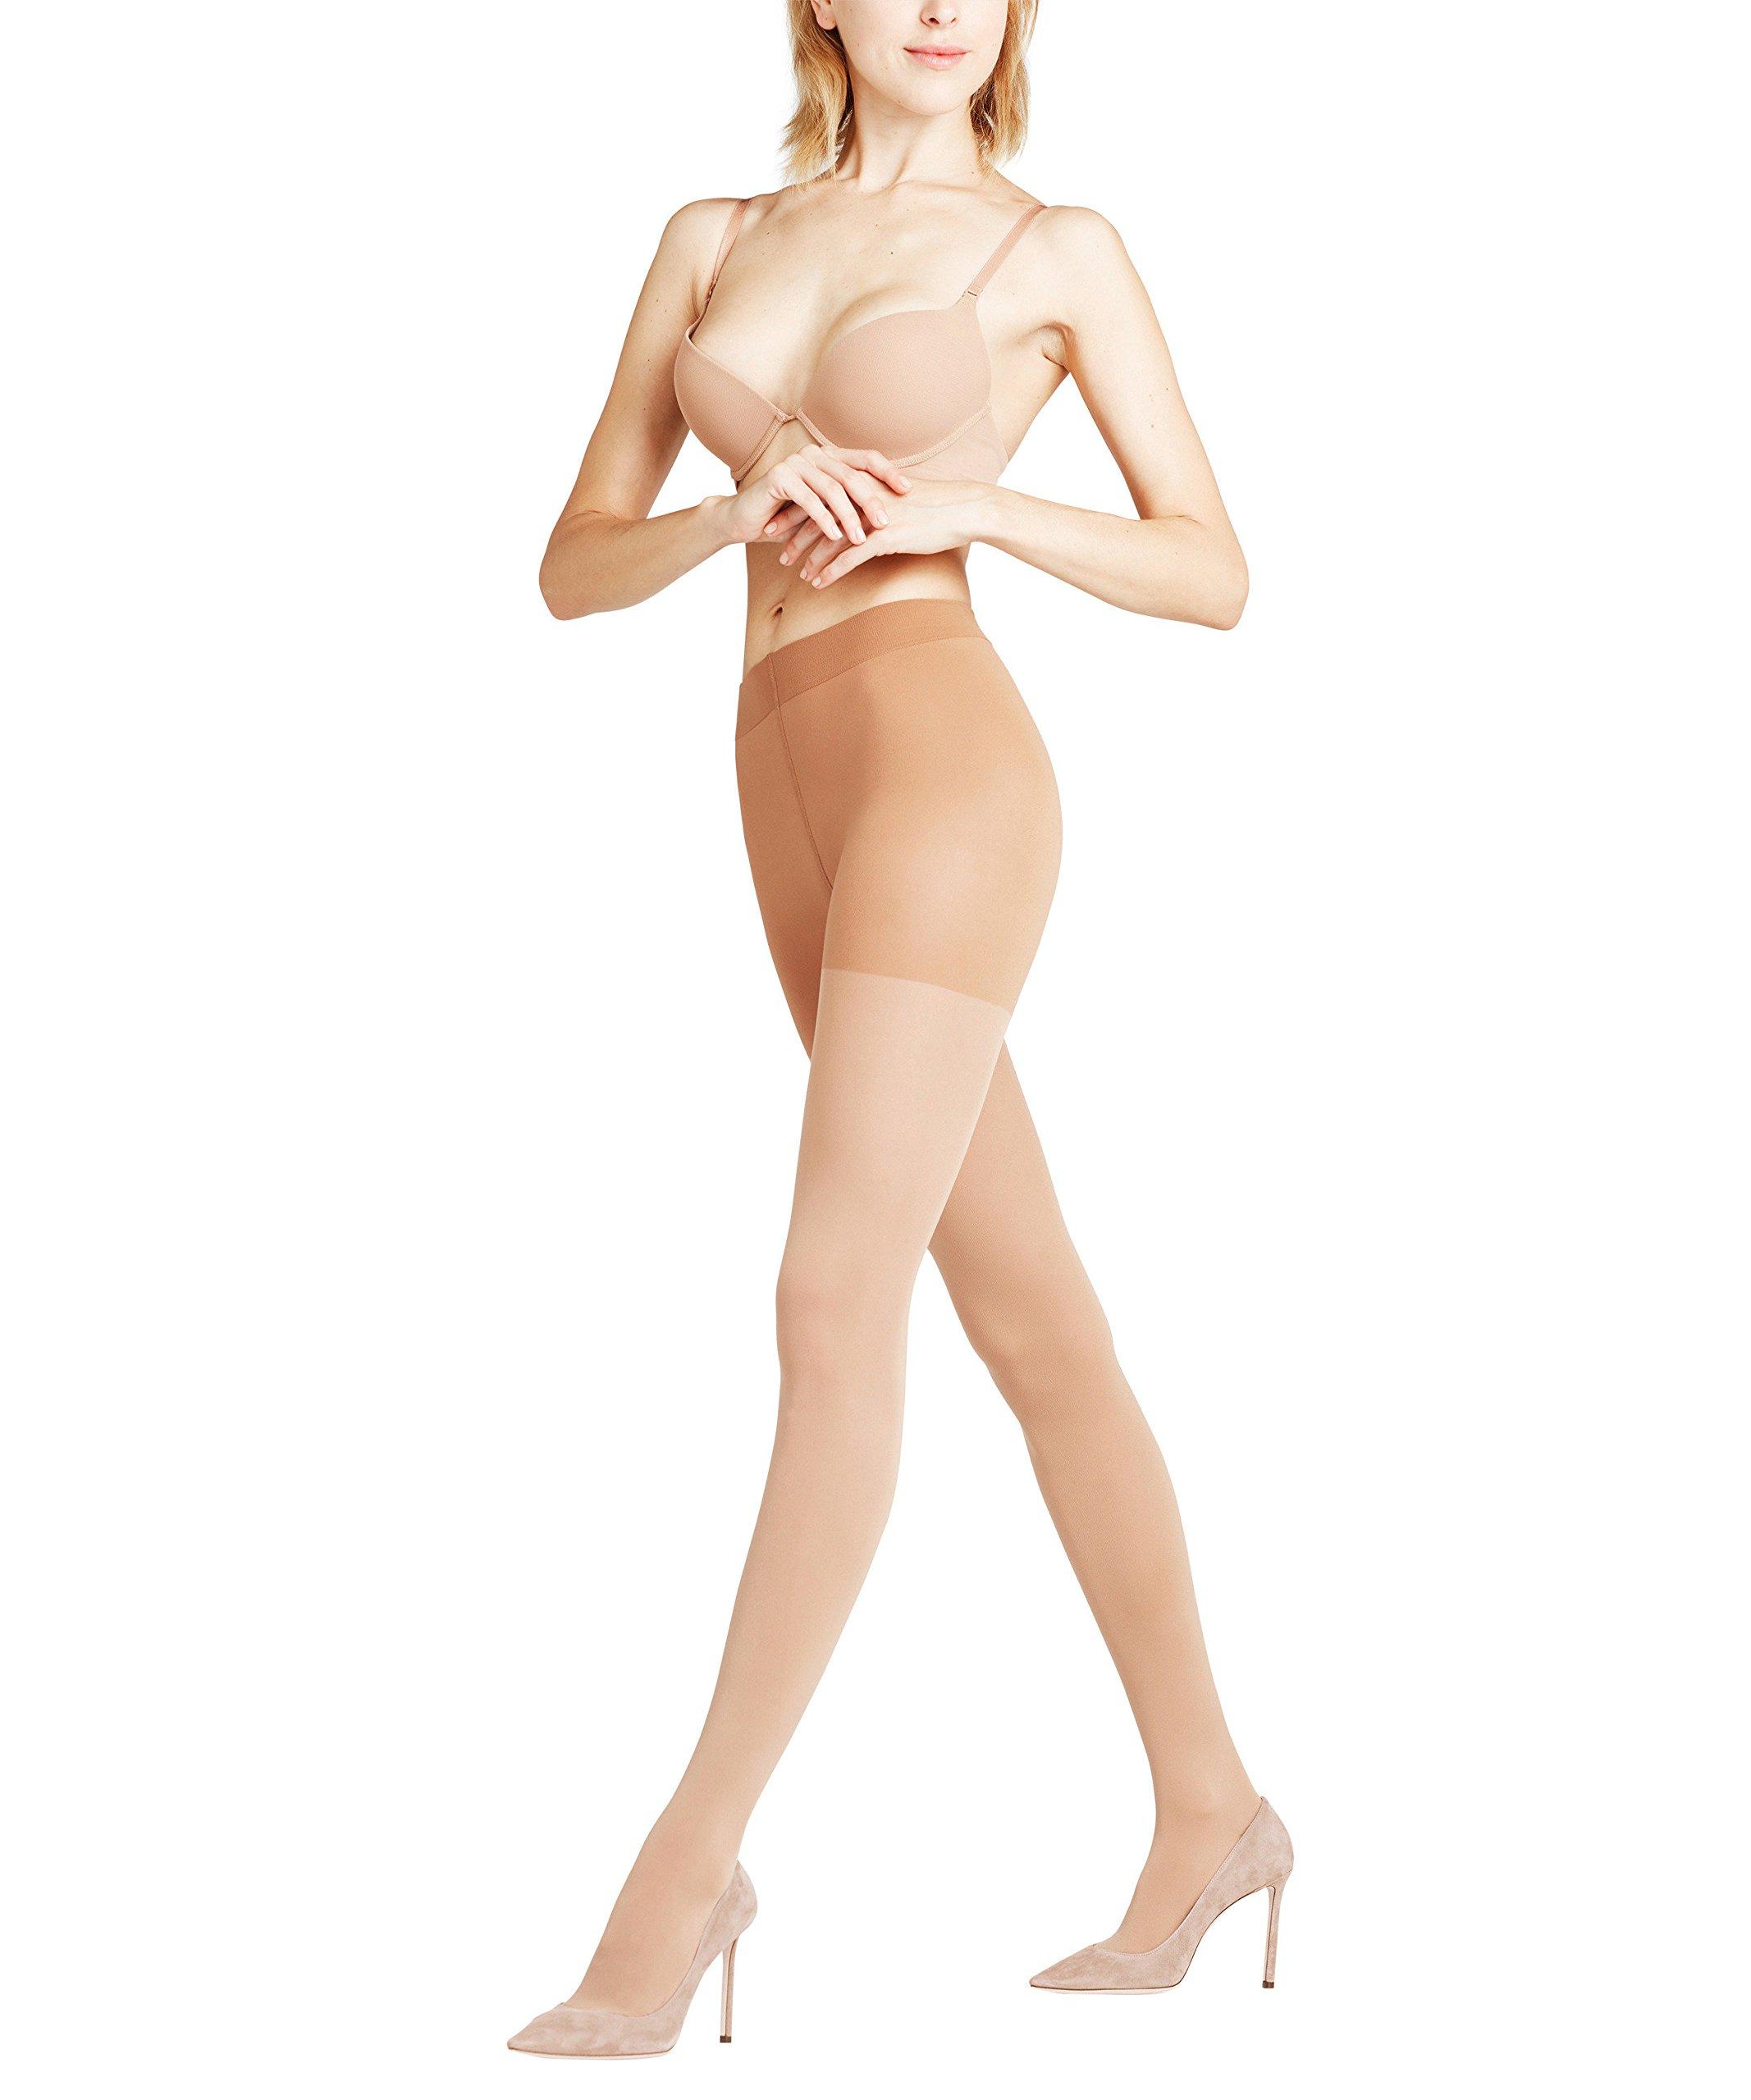 Beigepowder FabricantS Leg 50 Collants Falke m Energizer Femme Den 406938taille thxQrdsC